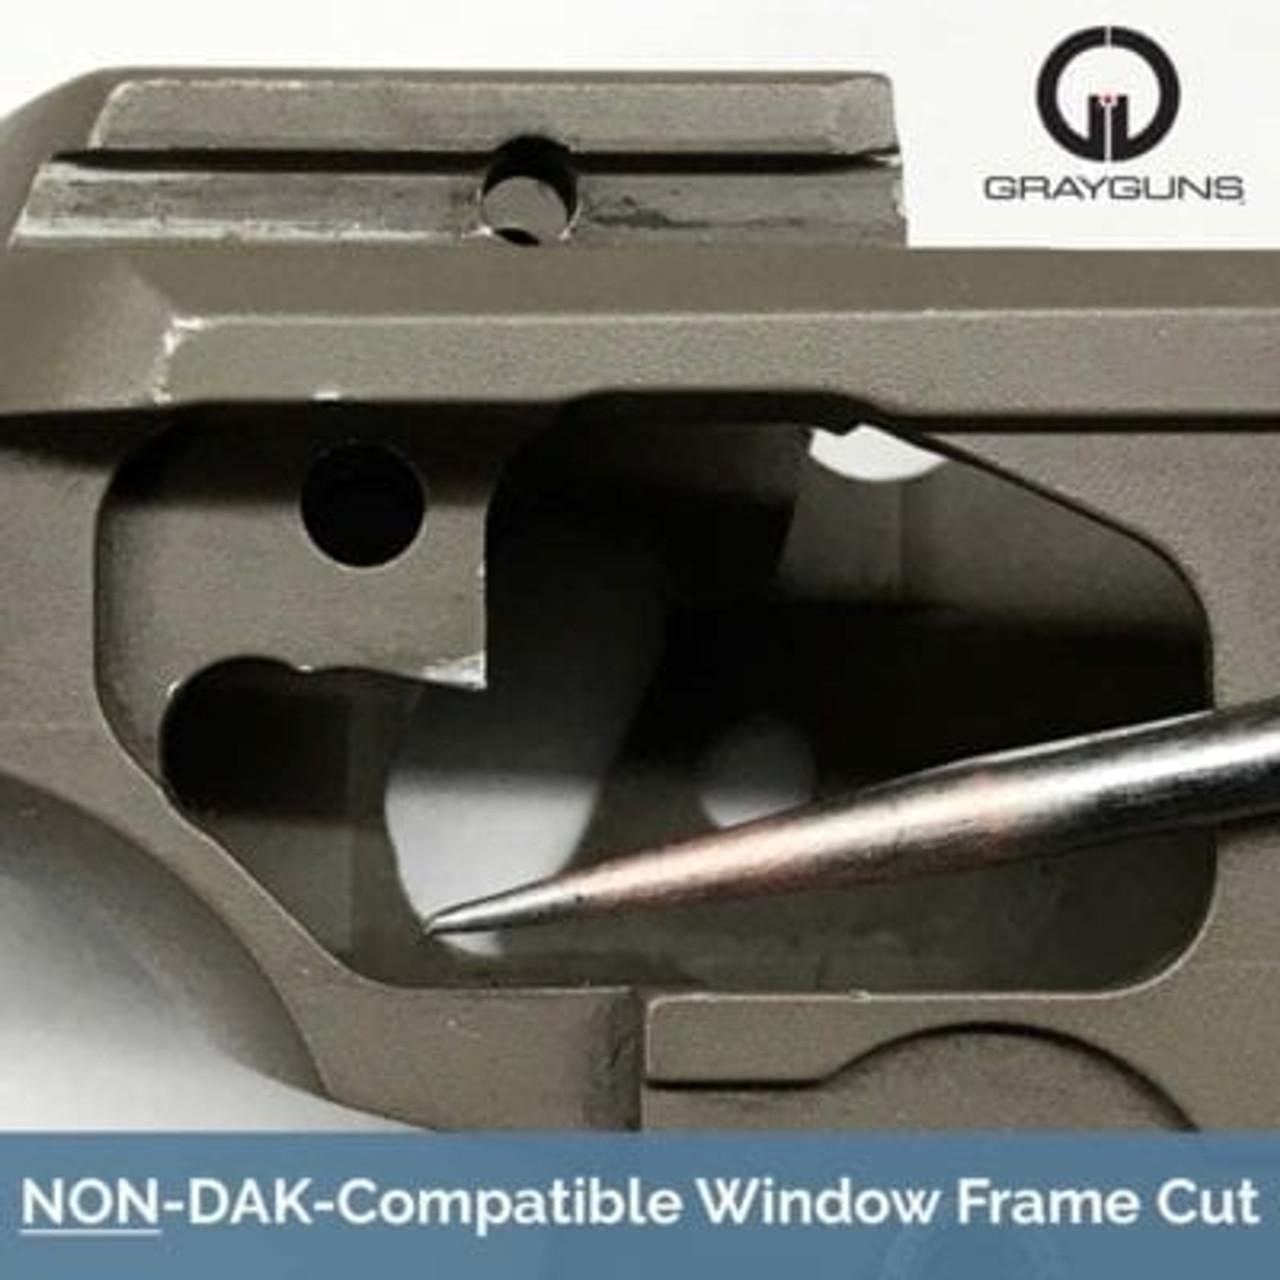 Grayguns SIG P-Series ELS (Enhanced Leverage System) Straight Trigger - Non-DAK